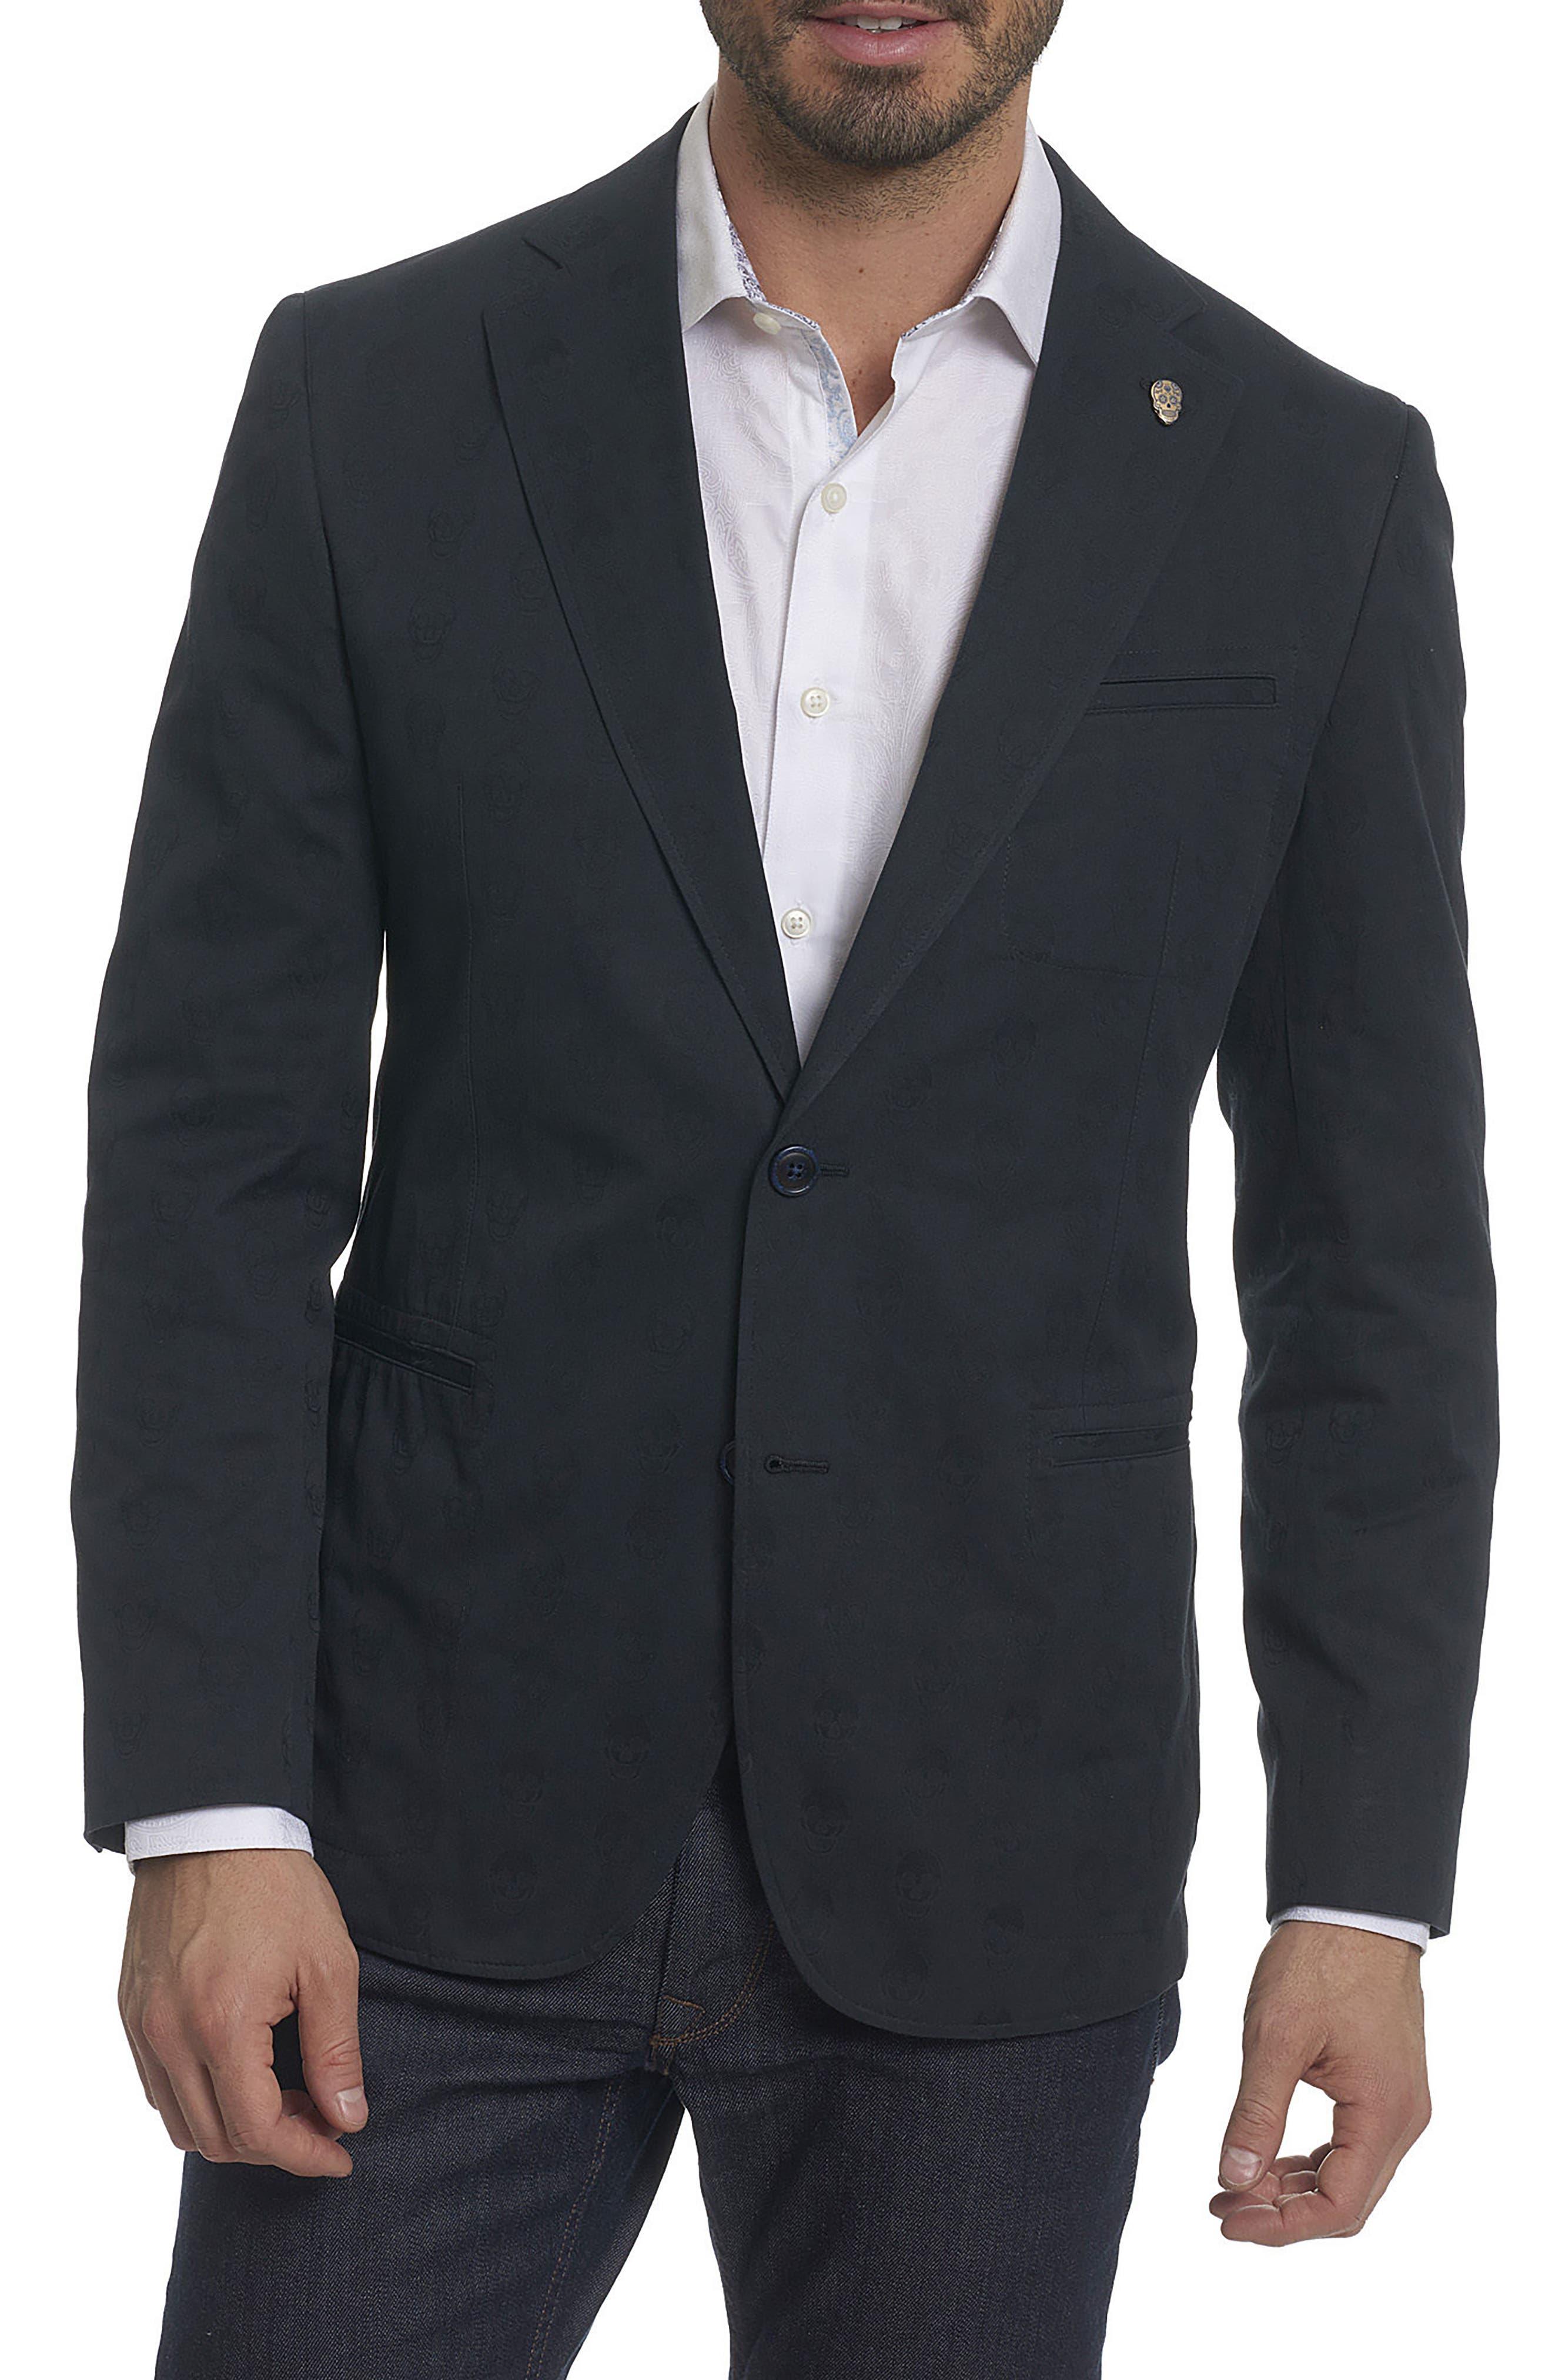 ROBERT GRAHAM Skully Jacquard Sport Coat